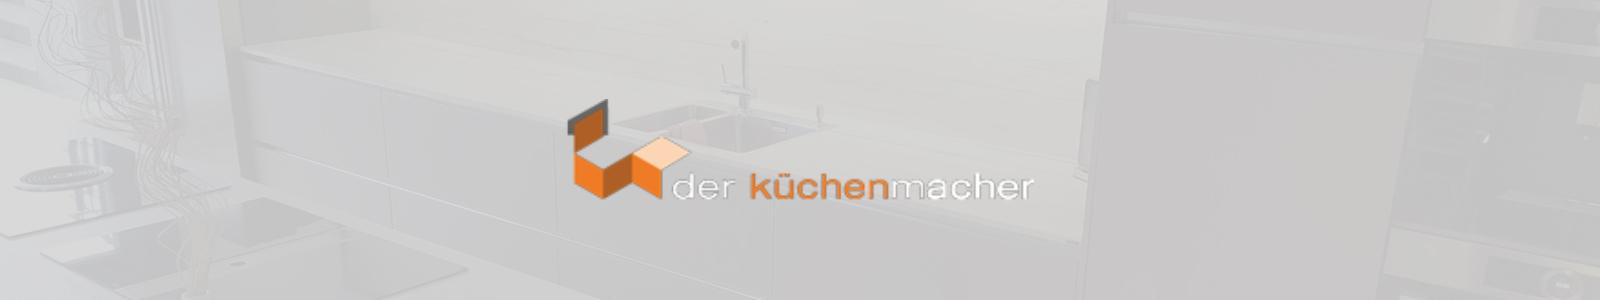 Der Kuchenmacher Kuma Gmbh In Wolfsburg Kuchenstudio Kuchenplanung